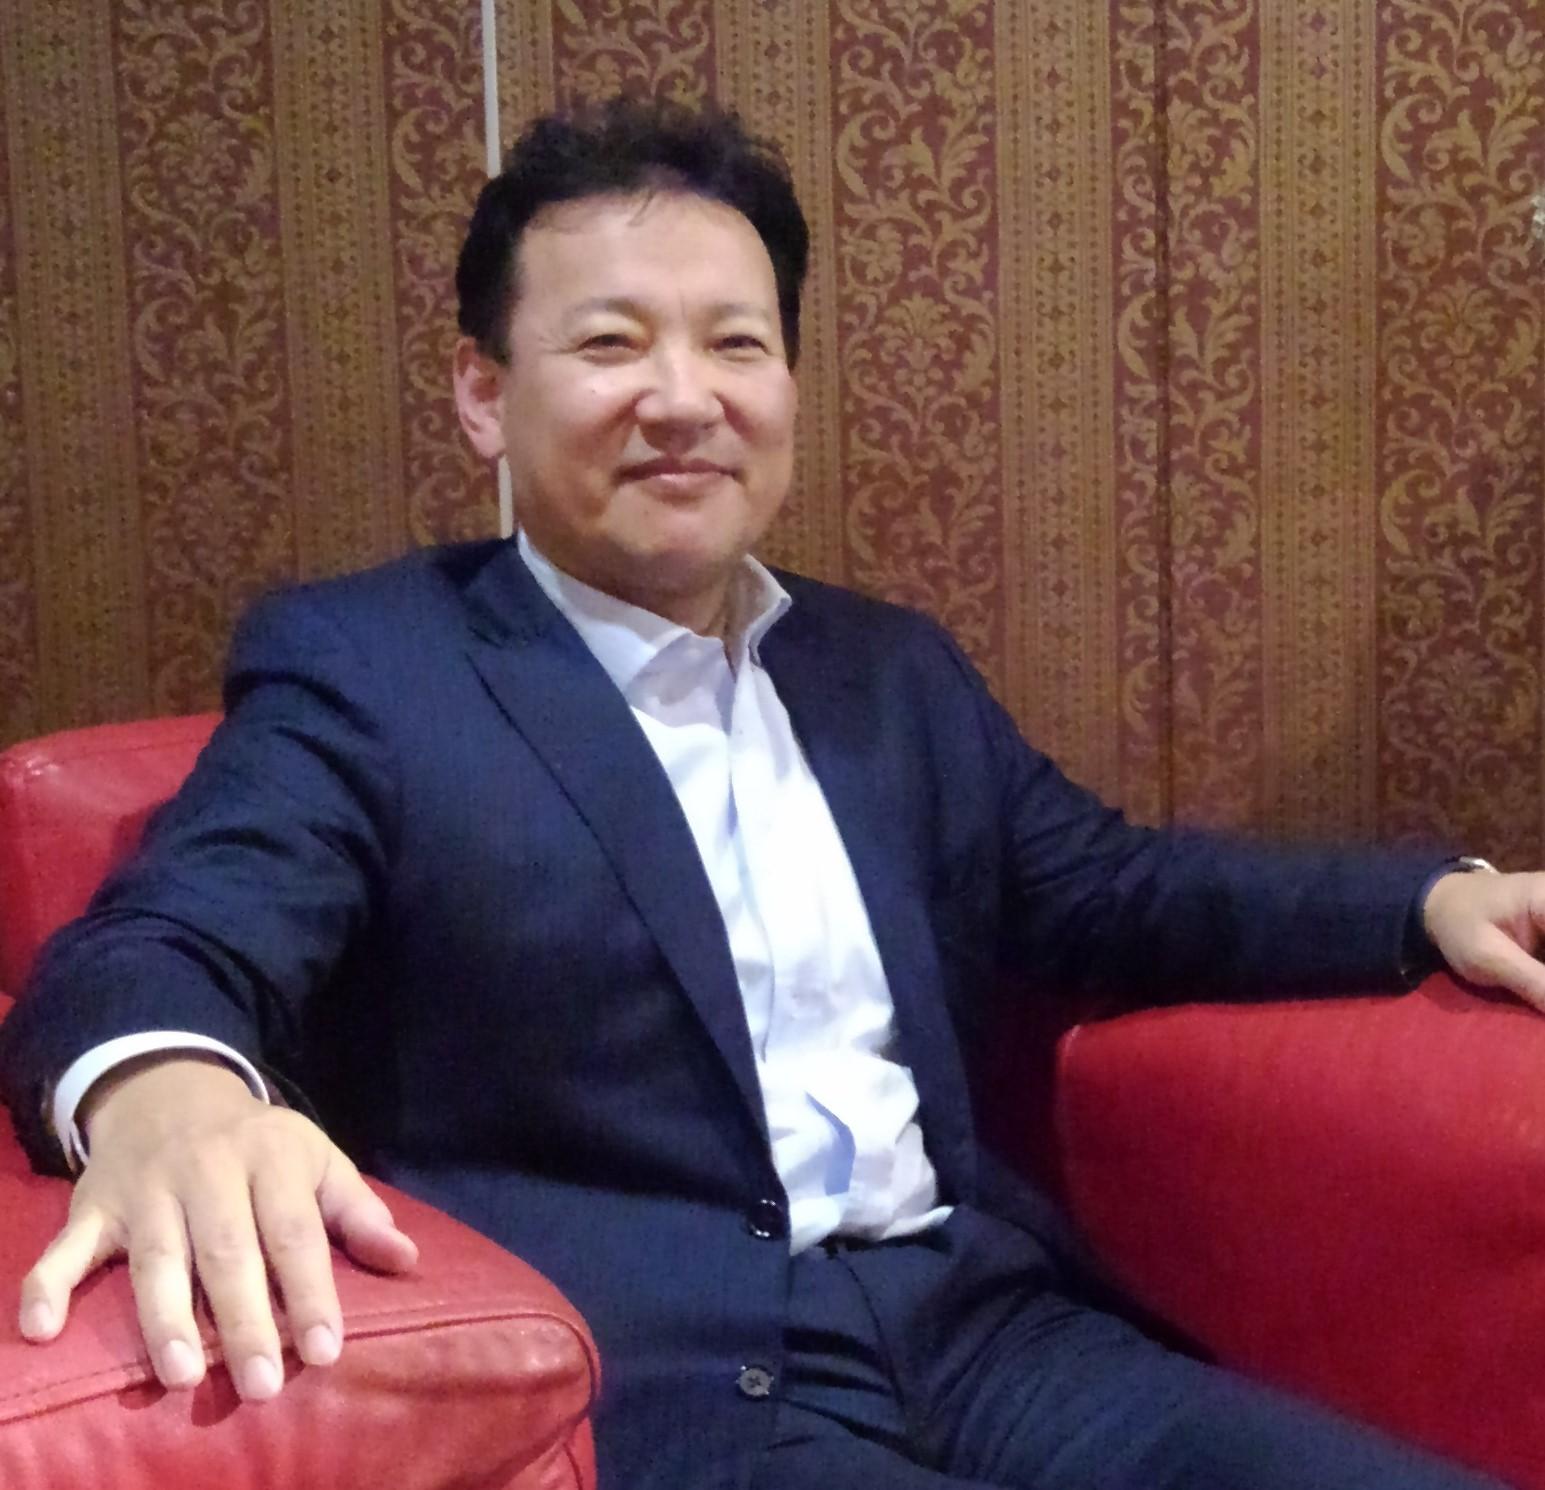 Dream Wall盛岡 株式会社 WeLove 結婚式代表取締役 東京都在住 後藤様